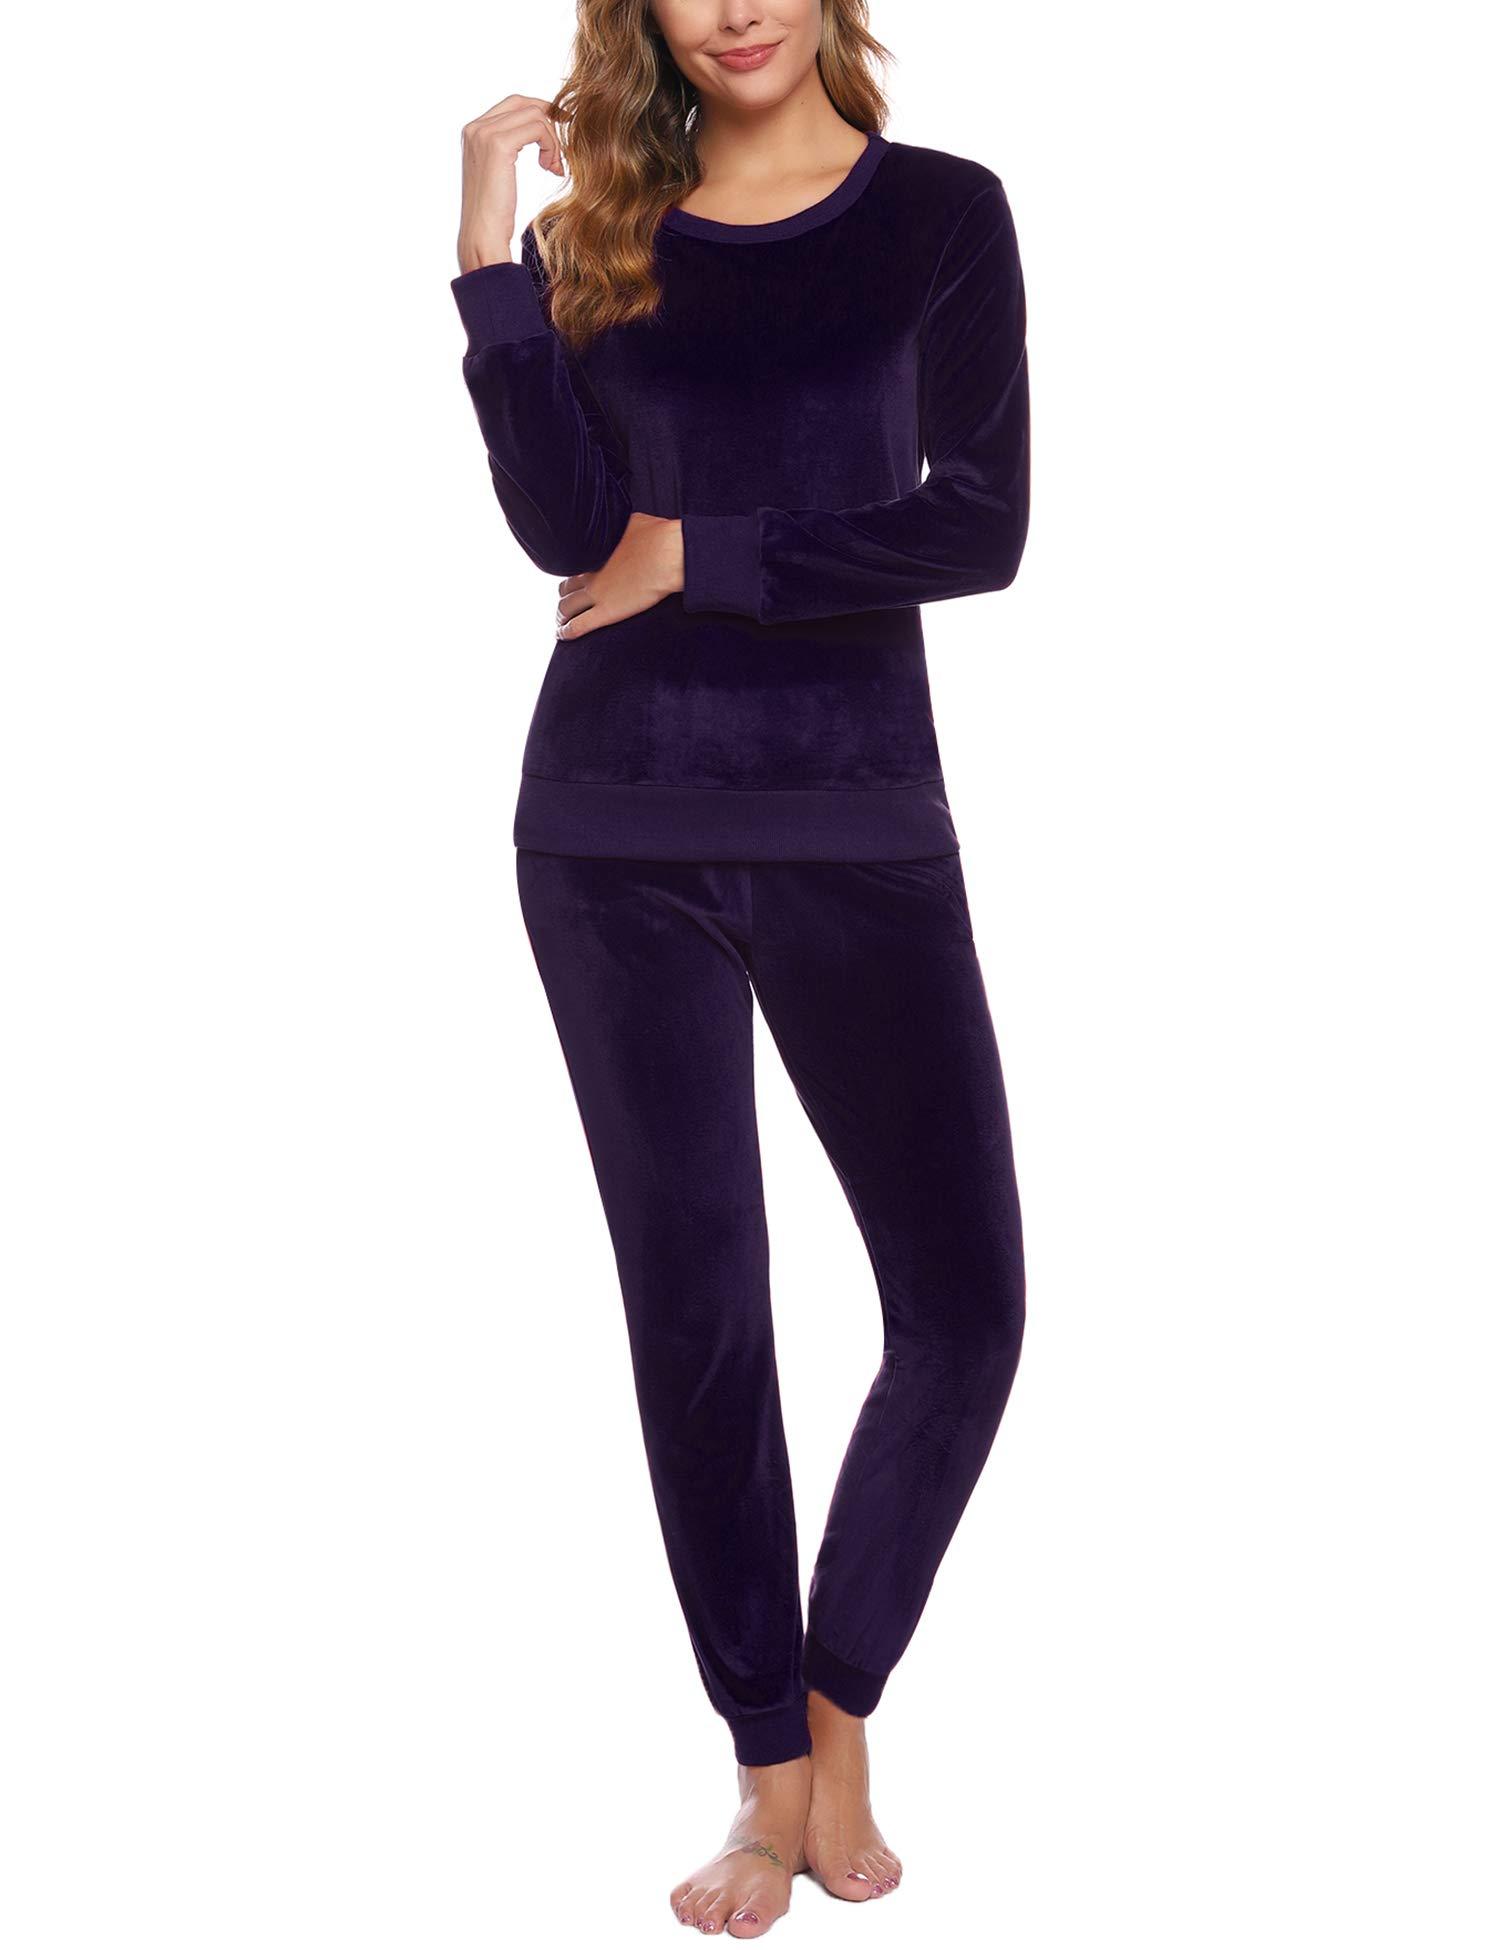 Abollria Women's Solid Velour Sweatsuit Set Sport Suits Tracksuits Purple by Abollria